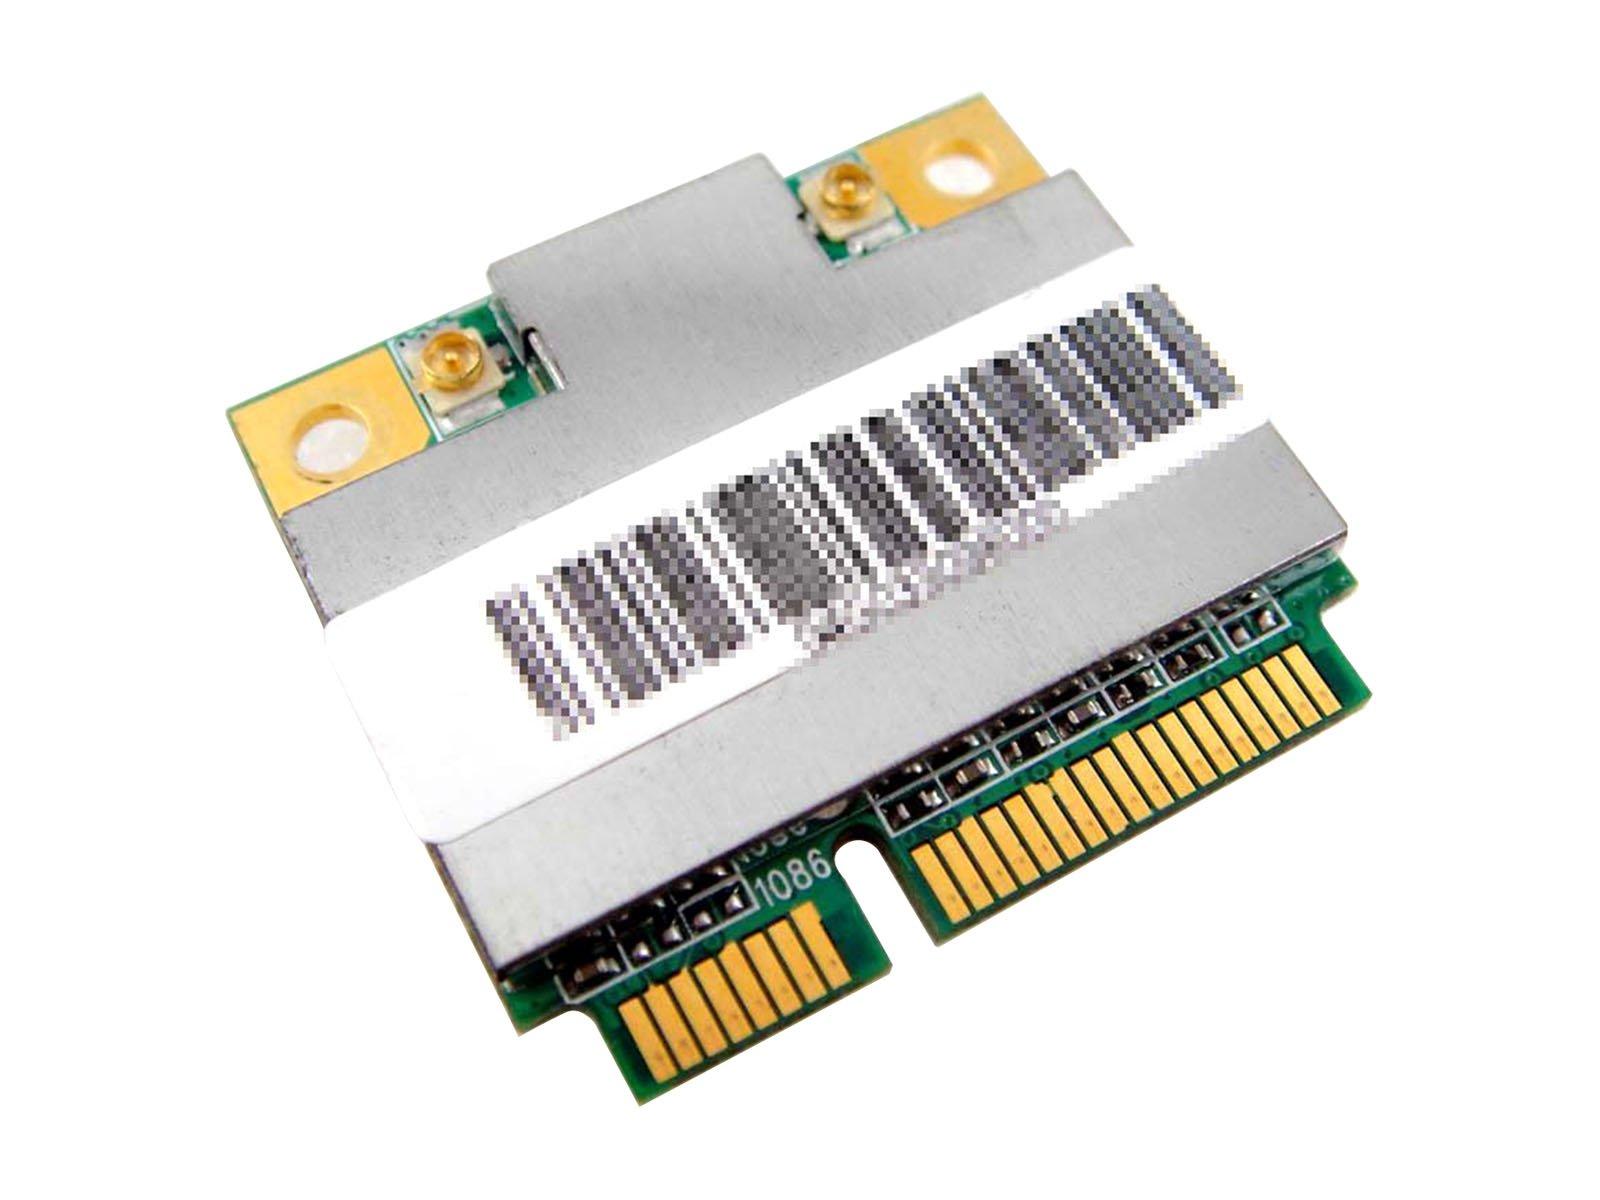 Qualcomm / Atheros AR9485 AR5B225 Half Mini PCIe PCI-Express WLAN WiFi Wireless BT Bluetooth Card for HP compaq Laptop 654825-001 655795-001